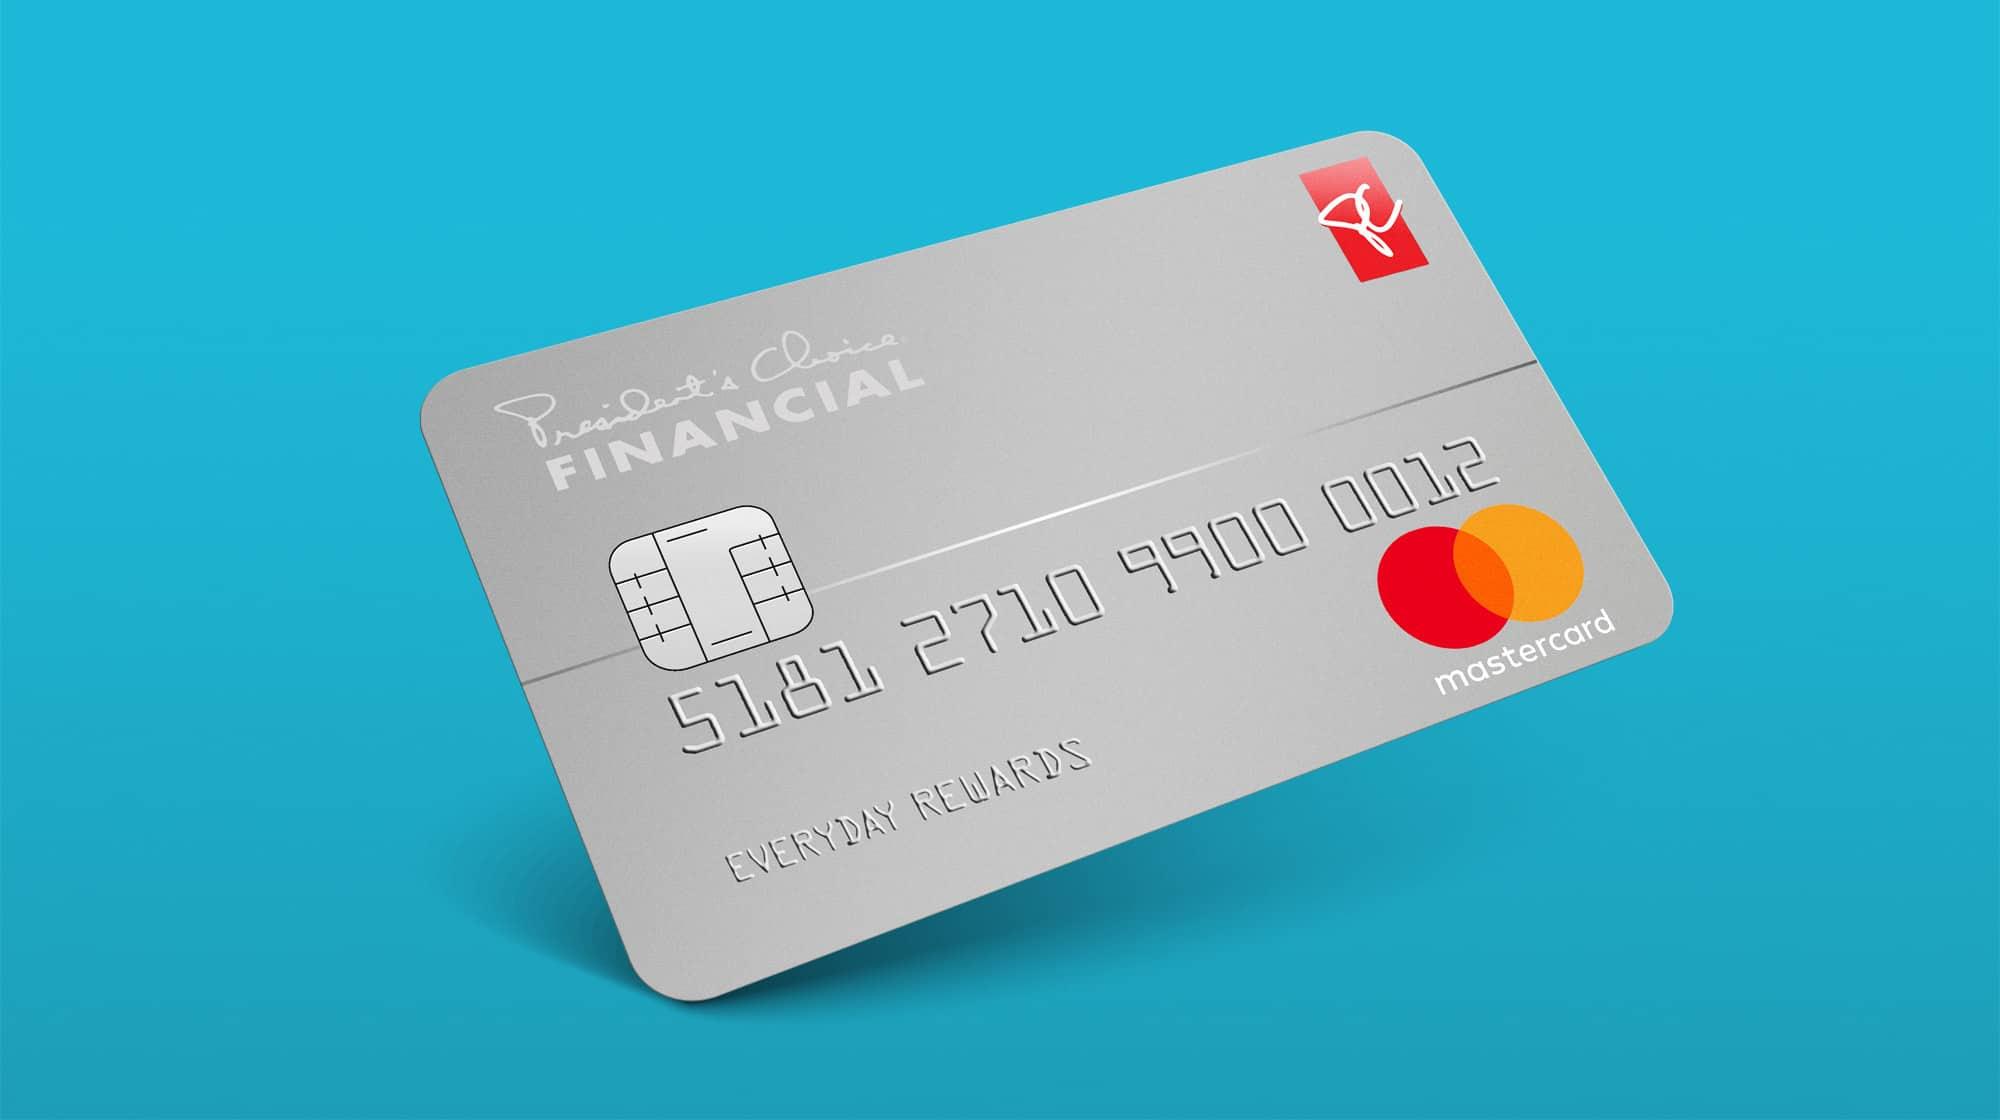 PC-Financial-Mastercard